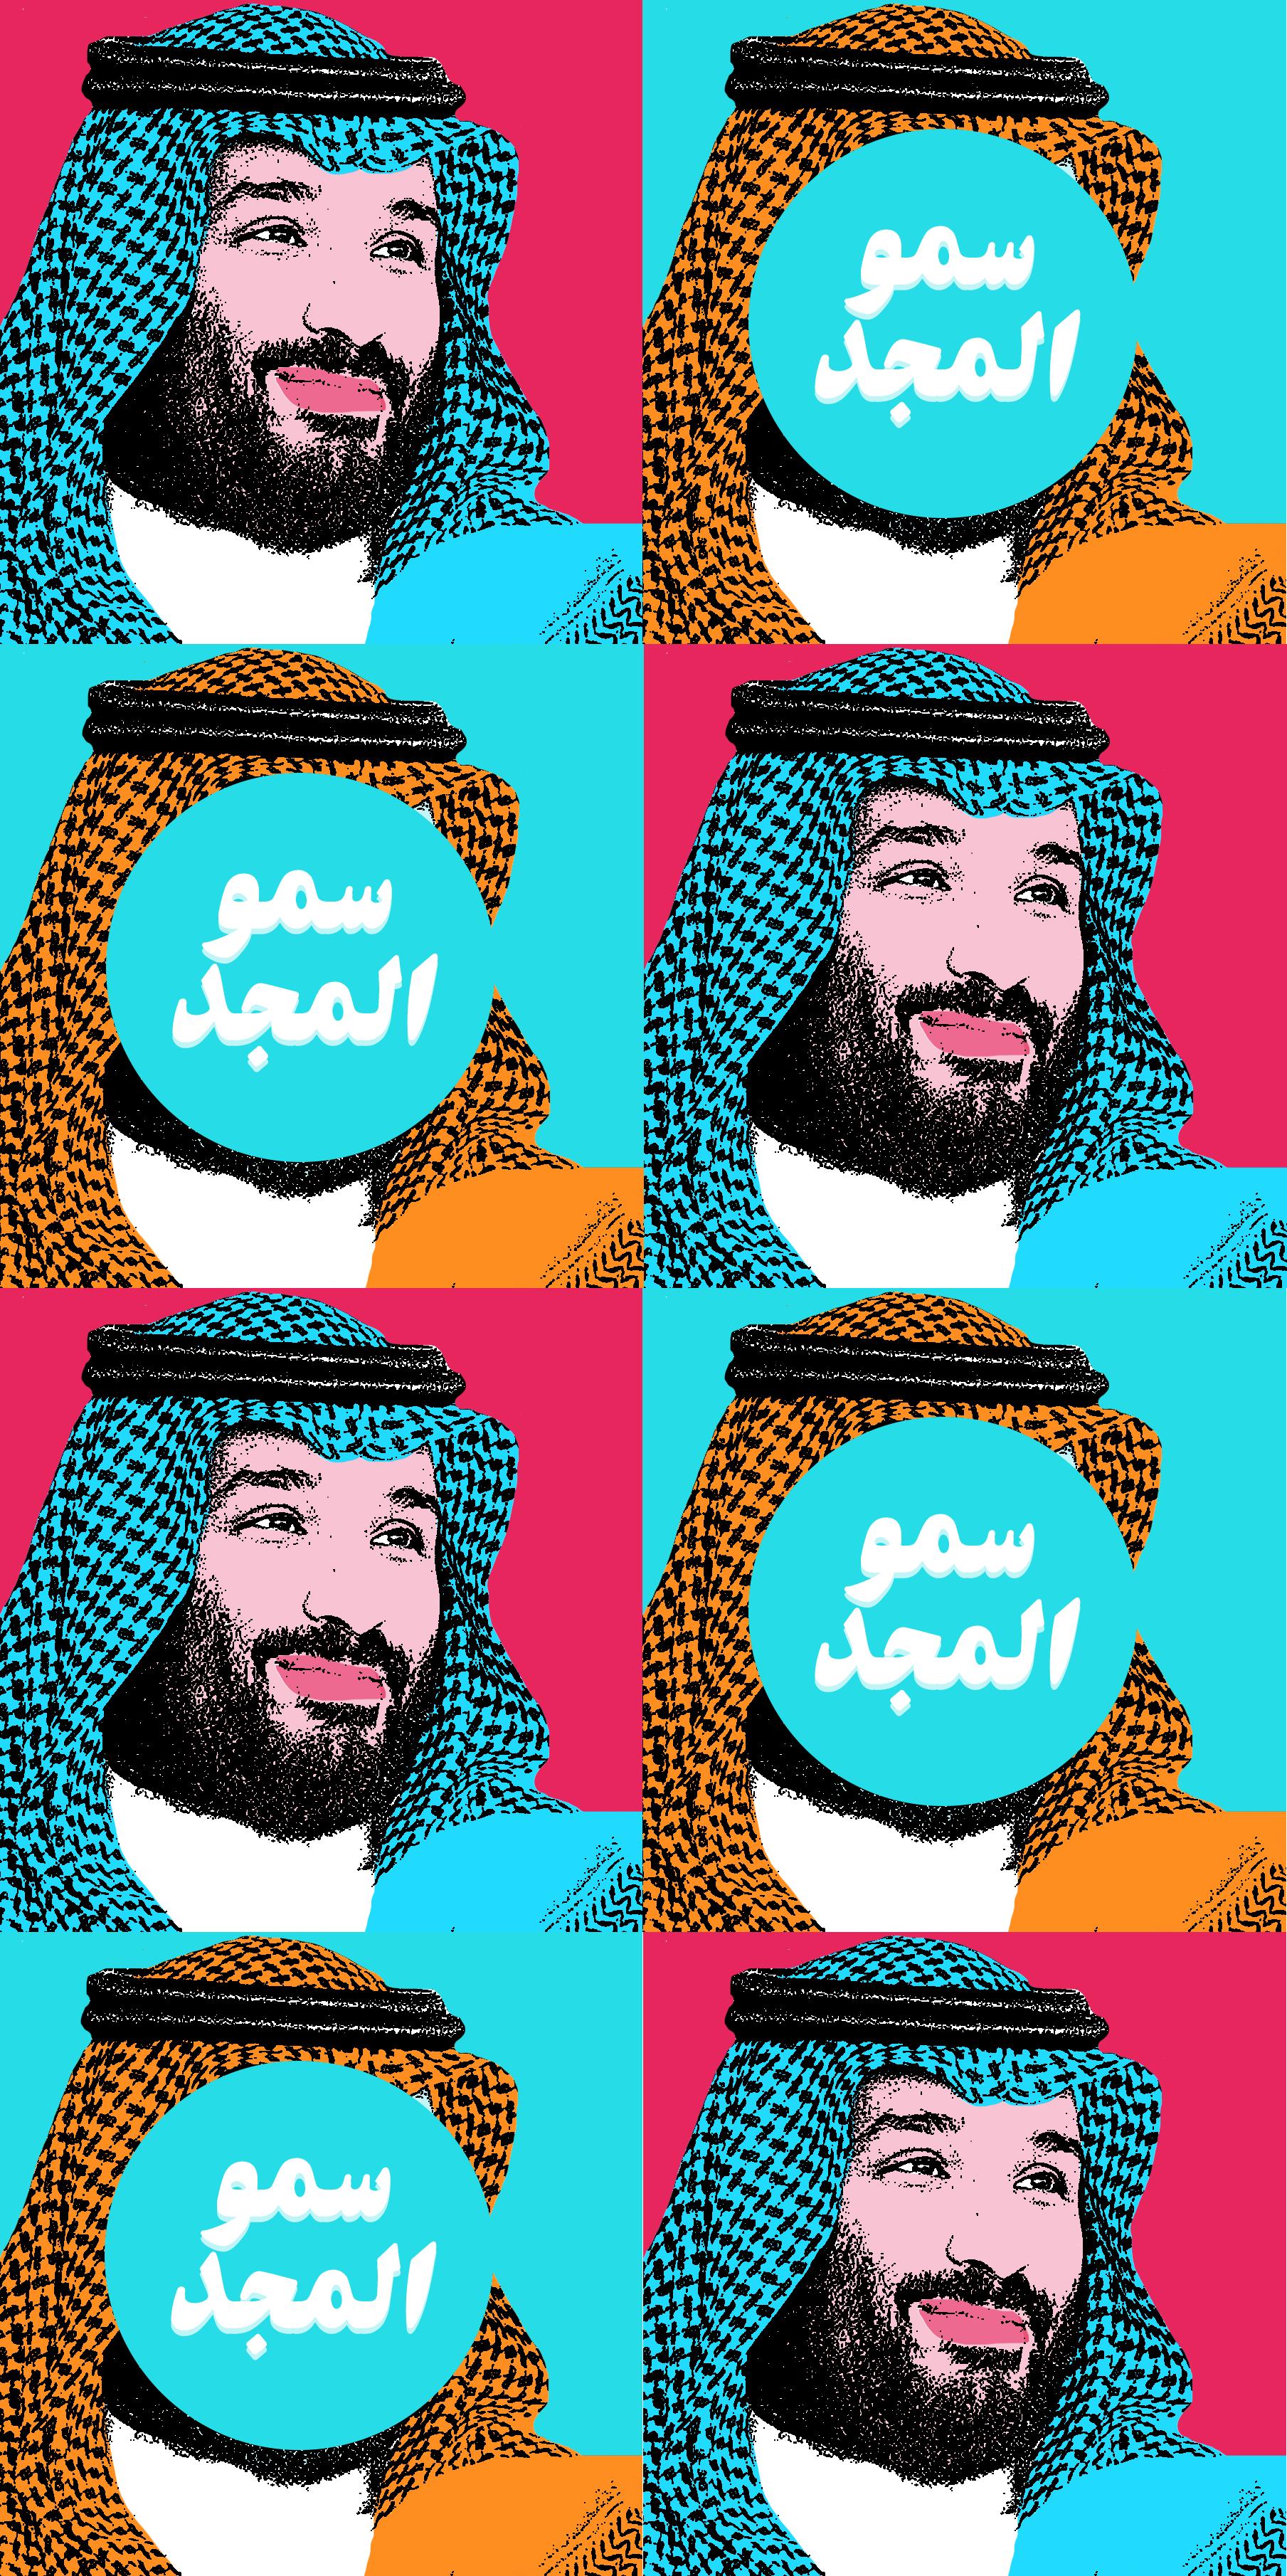 محمد بن سلمان Disney Wallpaper Funny Arabic Quotes Drawings